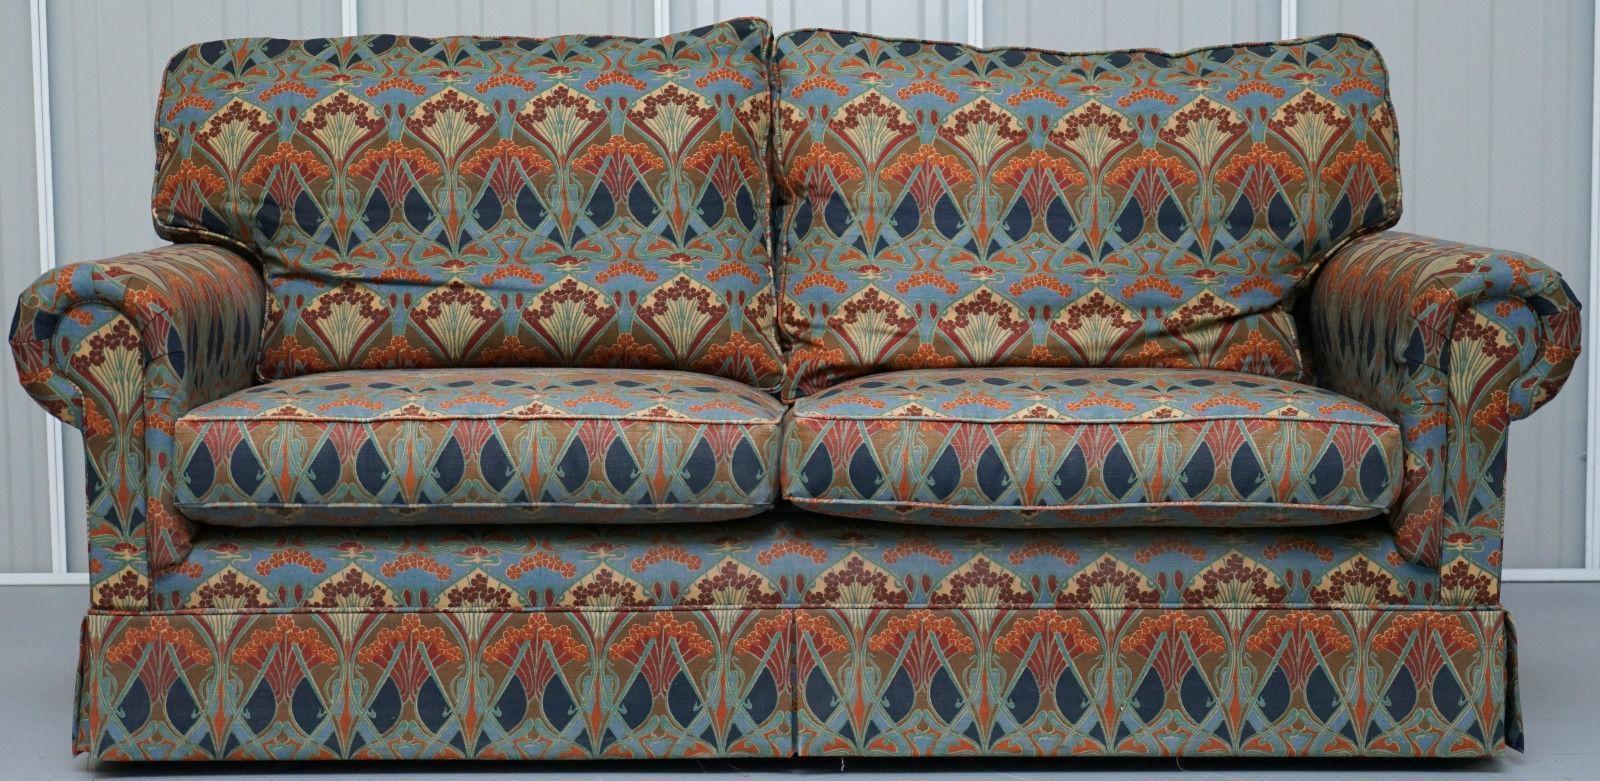 Classic English Fabric Sofas | Sofa Ideas For Classic English Sofas (View 7 of 21)